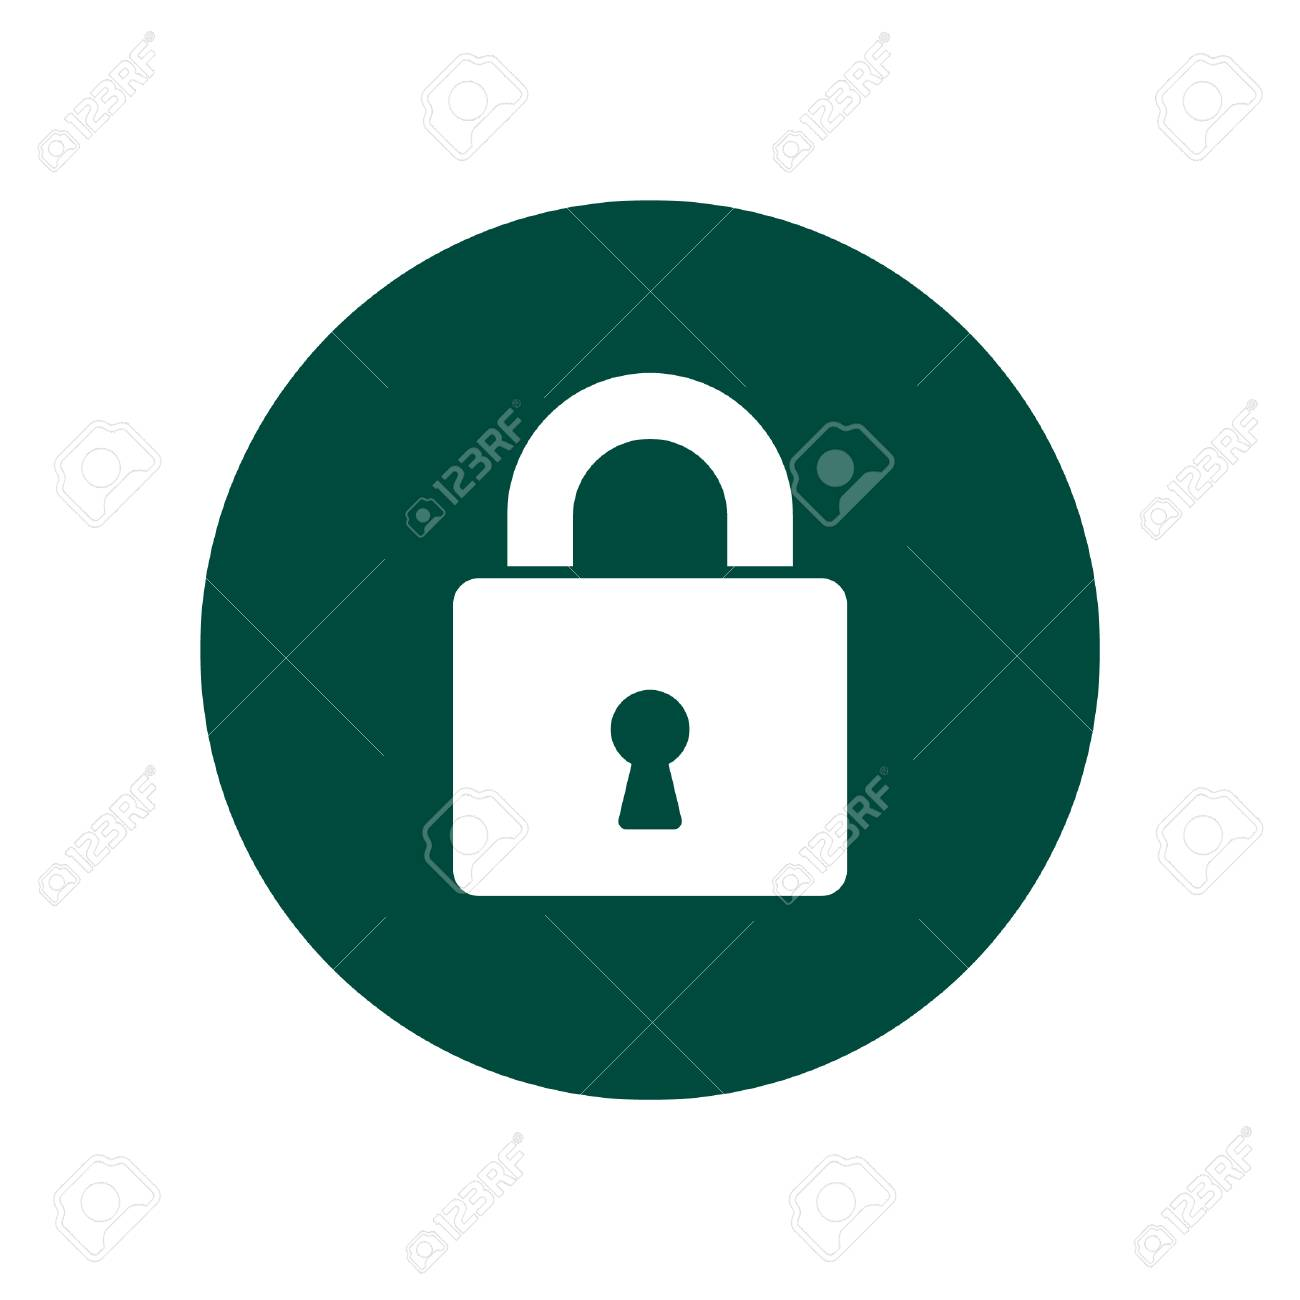 Lock Logo Vector Padlock Security Symbol For Web Site Design